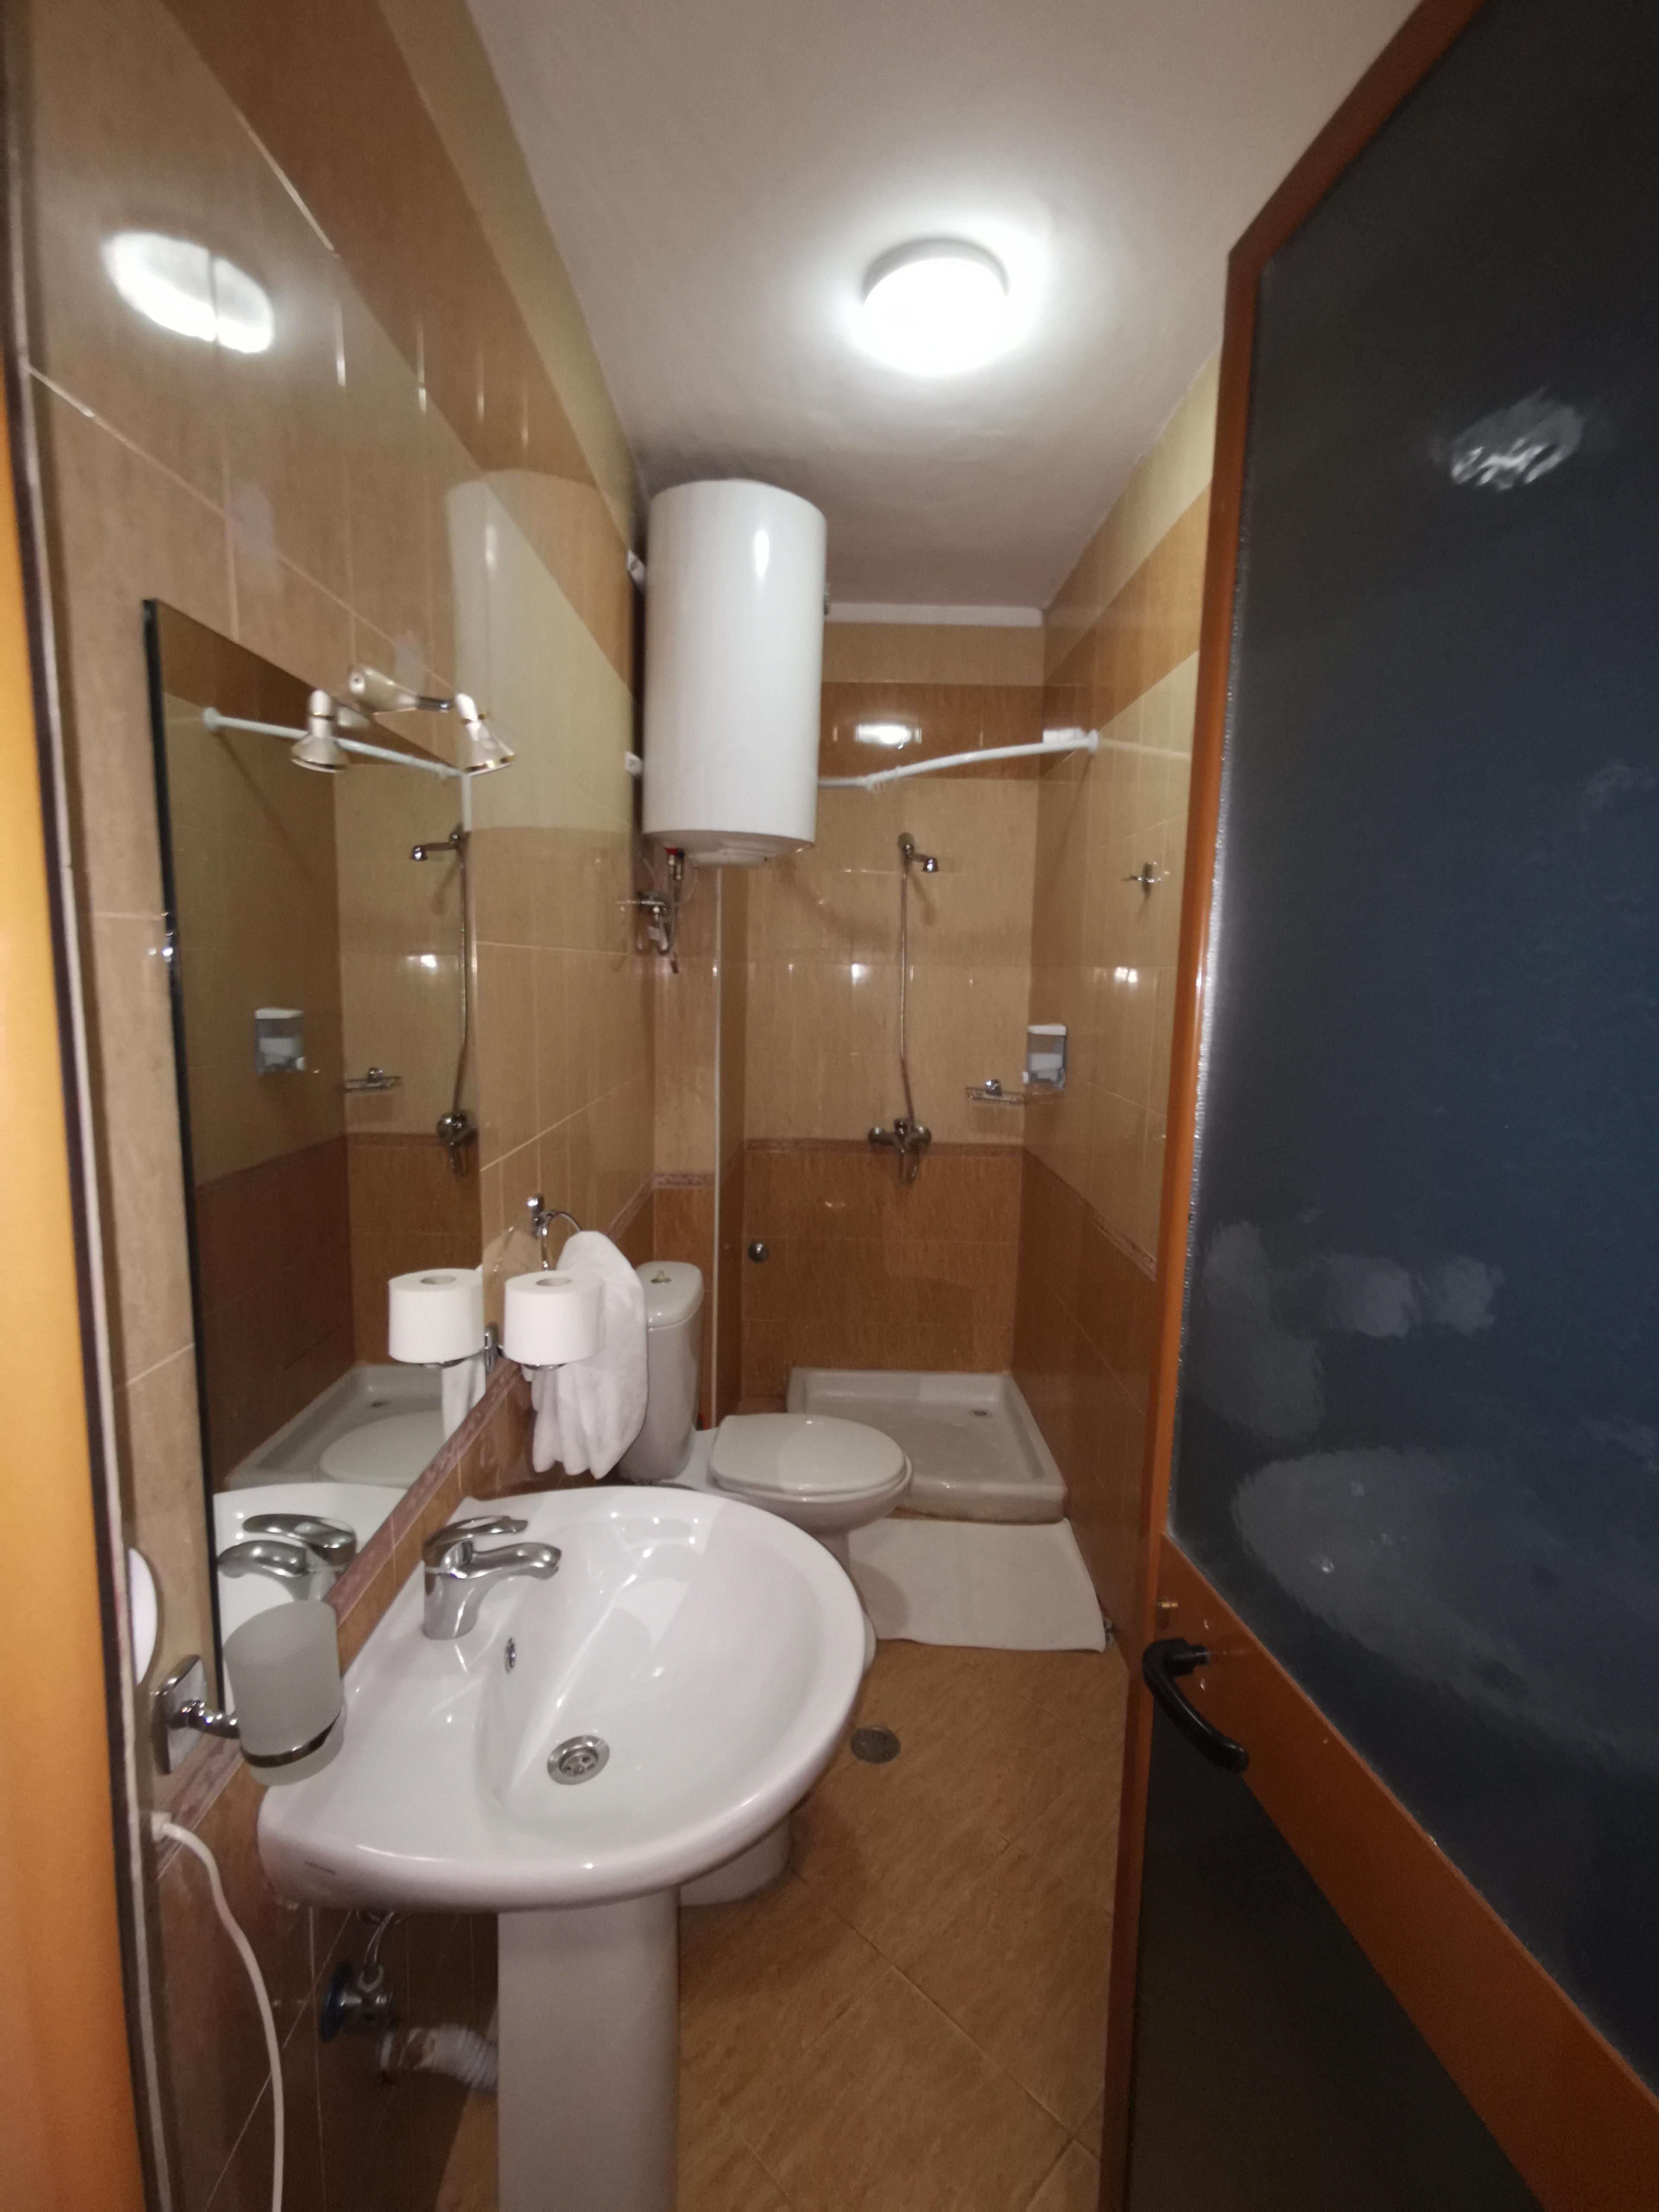 Letovanje Albanija autobusom, Drač Hotel Ibiza,toalet